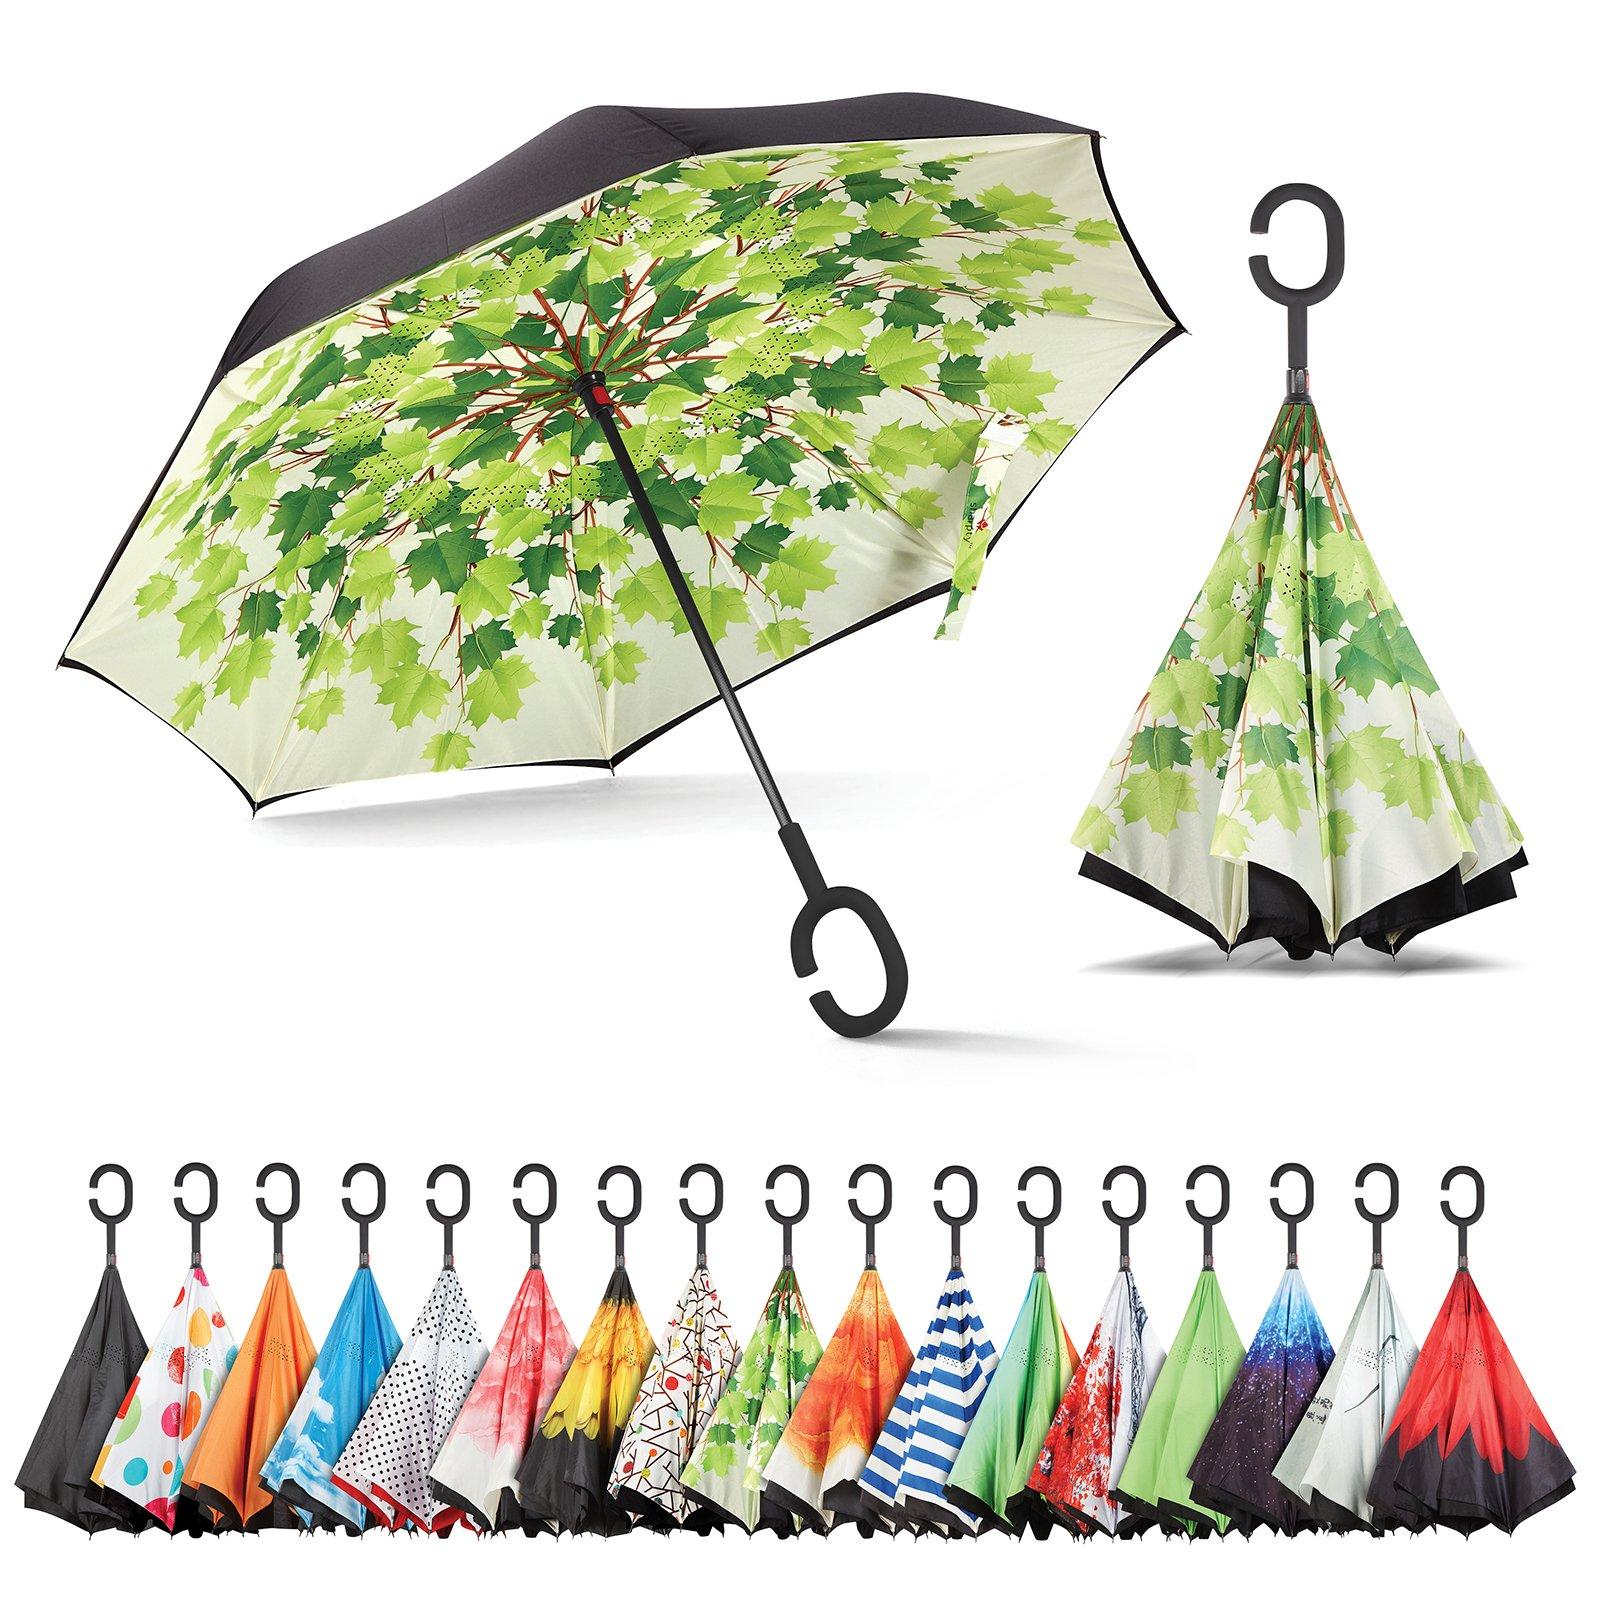 Sharpty Inverted Umbrella, Umbrella Windproof, Reverse Umbrella, Umbrellas for Women with UV Protection, Upside Down Umbrella with C-Shaped Handle (Green Shade)